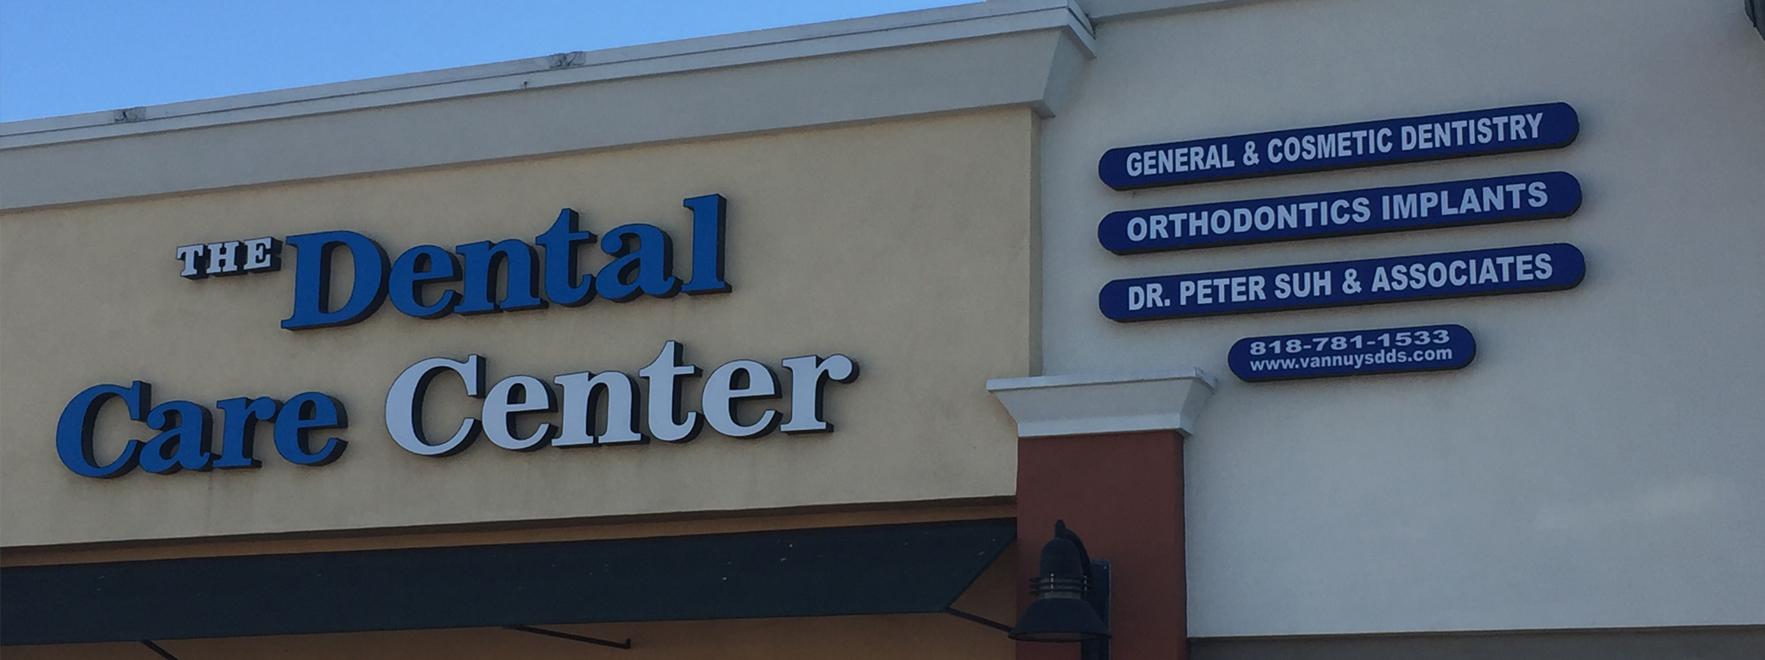 Meet Our Team | The Dental Care Center | Dentist 91405